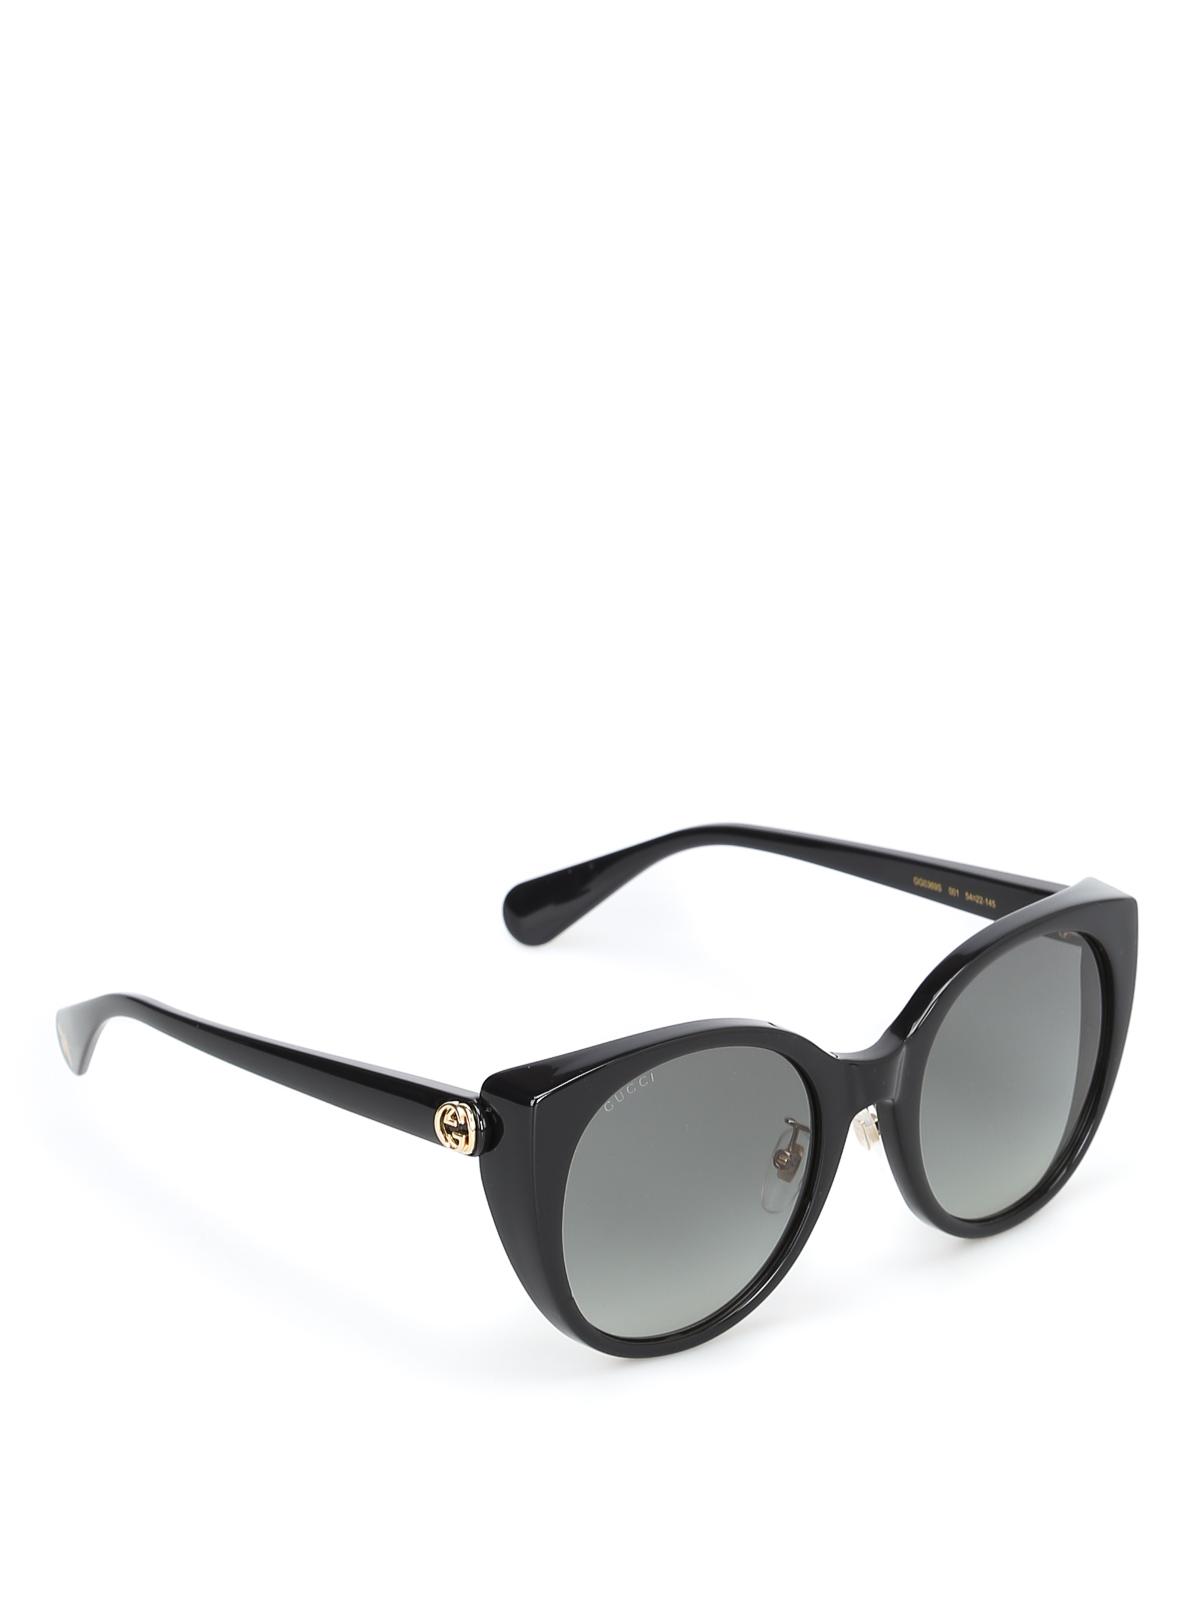 a1c3b24f45a12 Gucci - Black cat eye sunglasses with golden details - sunglasses ...